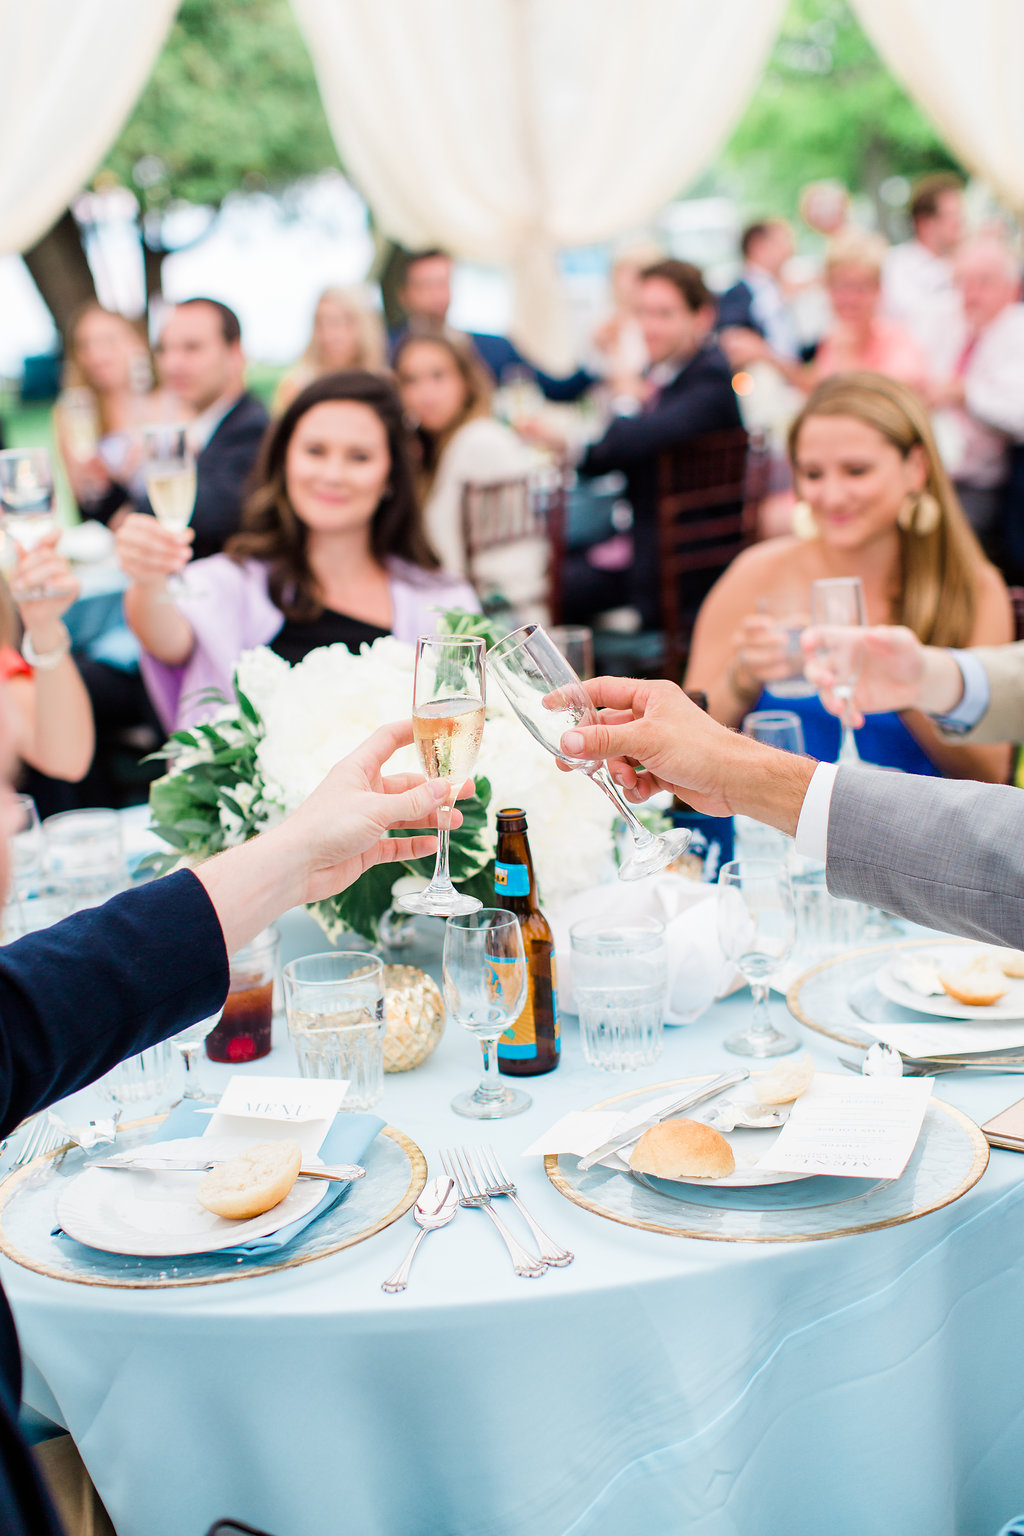 Webb+Wedding+ReceptionA-82.jpg